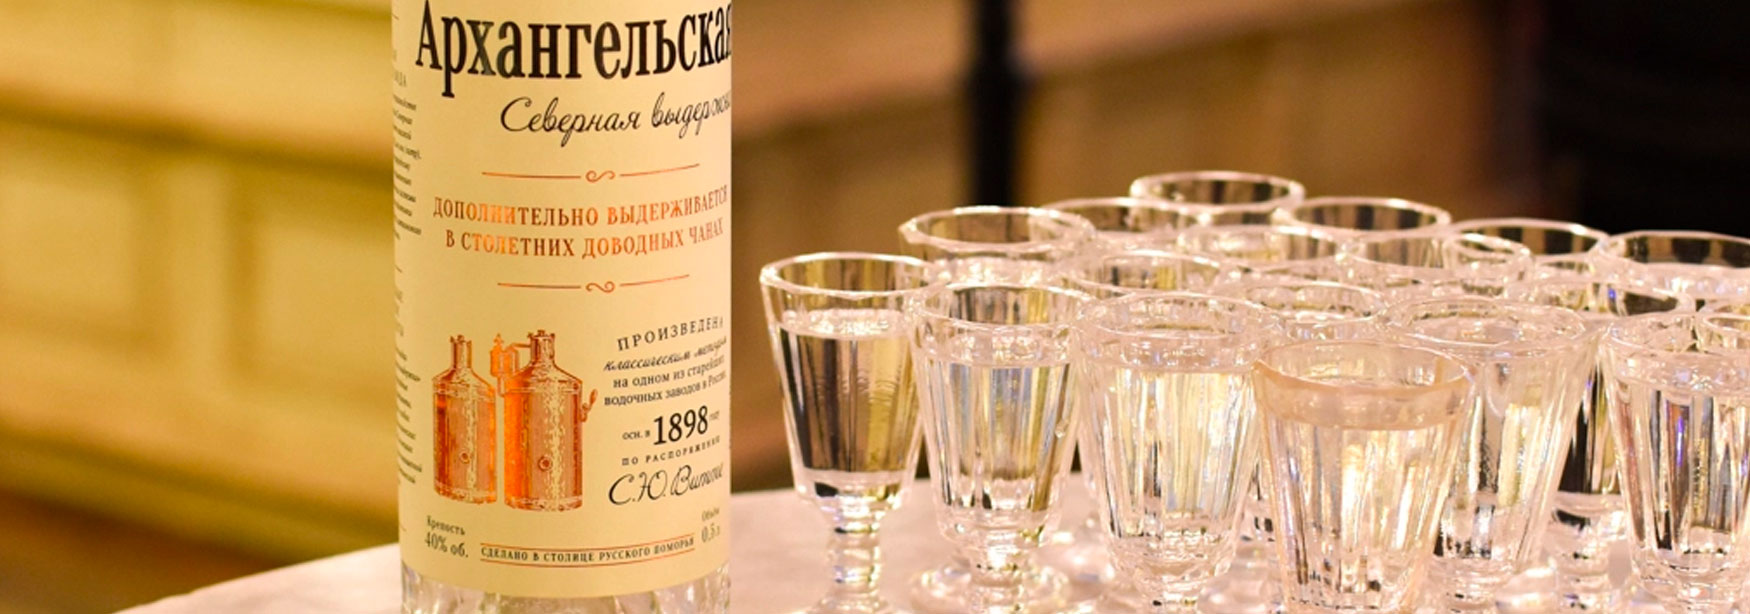 Wodka Museum St. Petersburg Russland